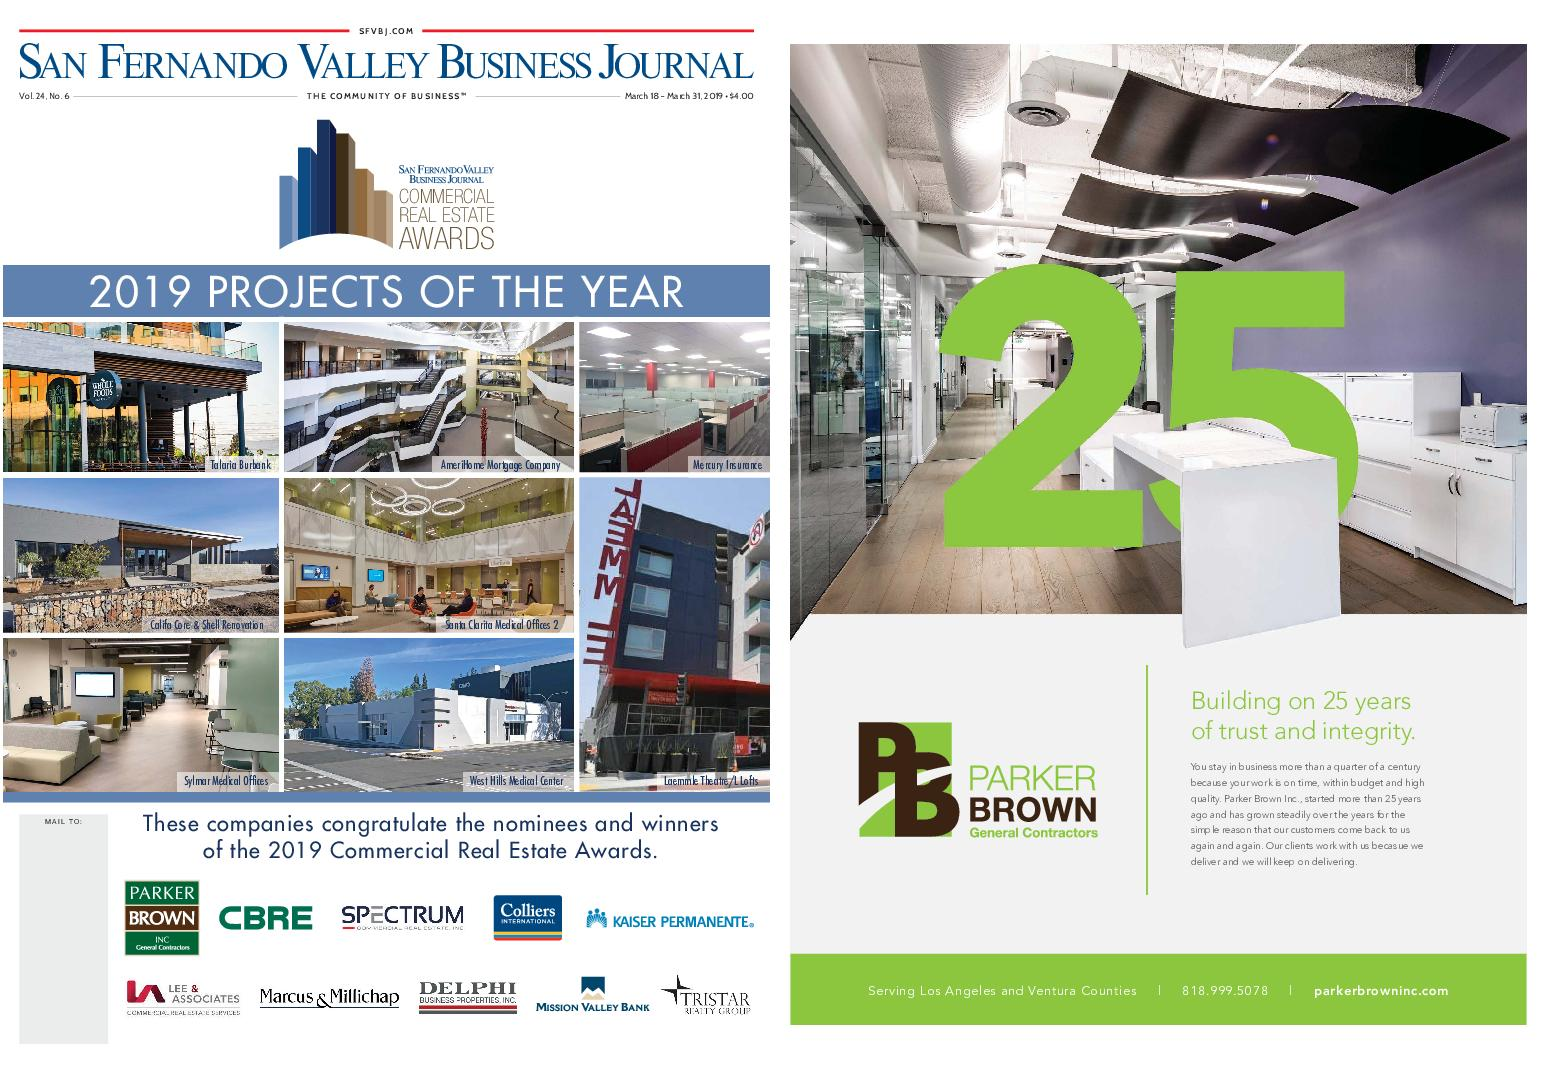 San Fernando Valley Business Journal – March 18, 2019